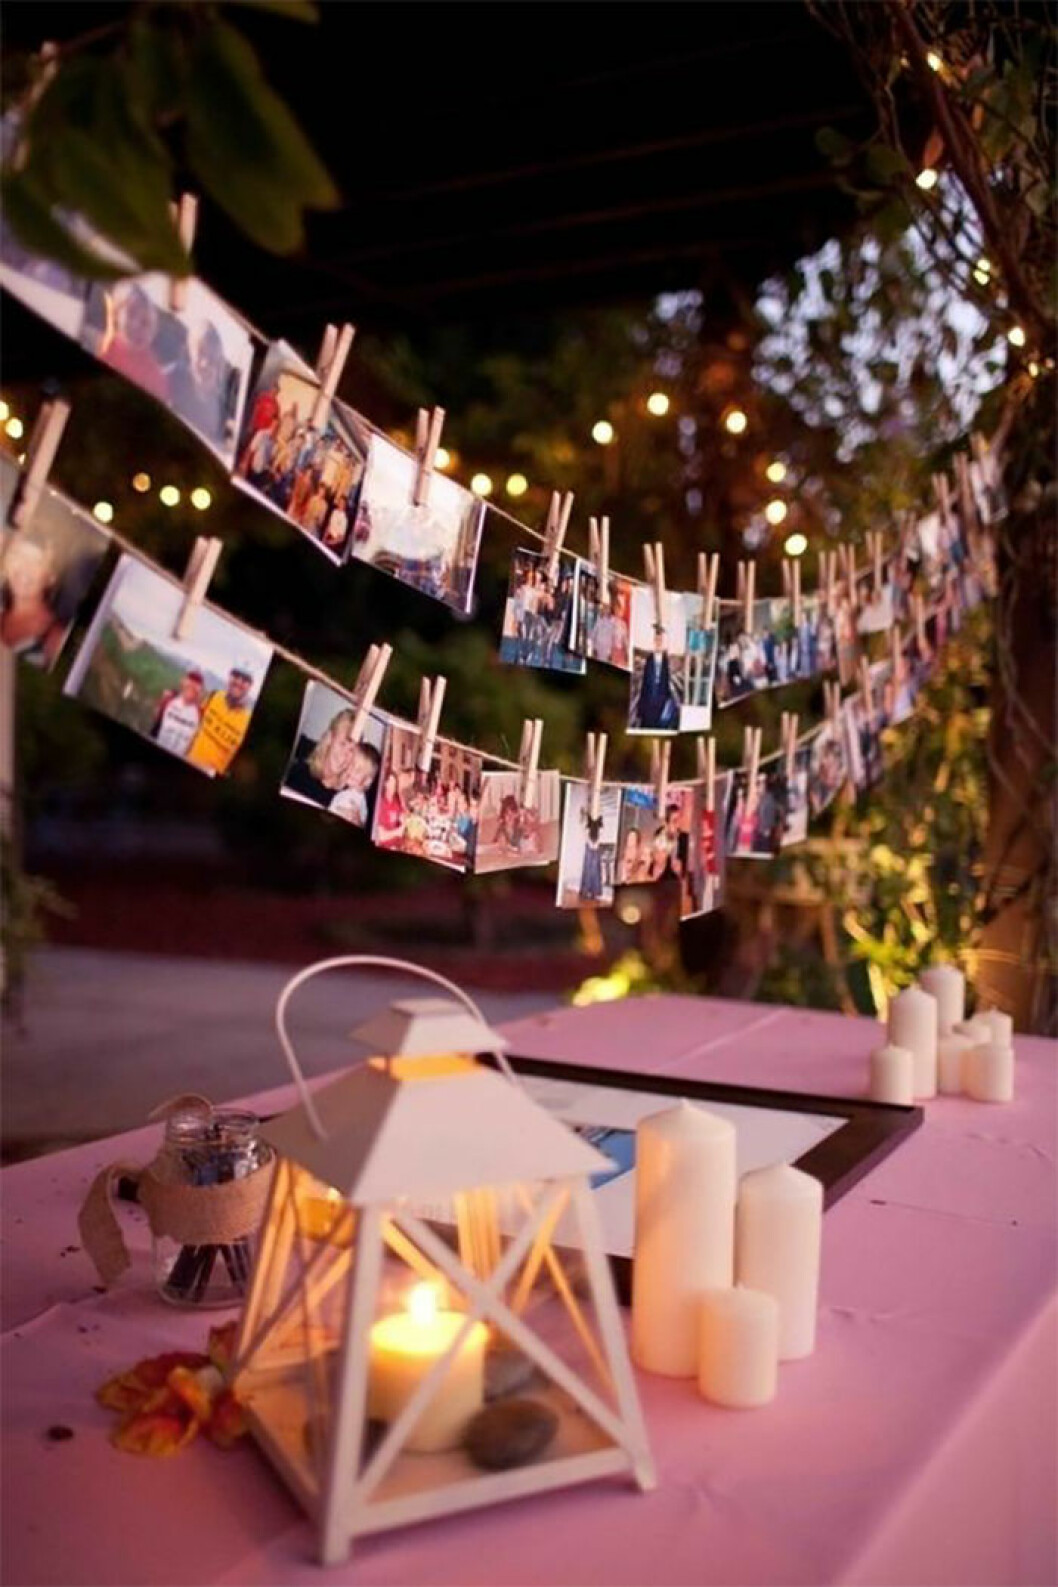 Fotogirlanger till bröllop.